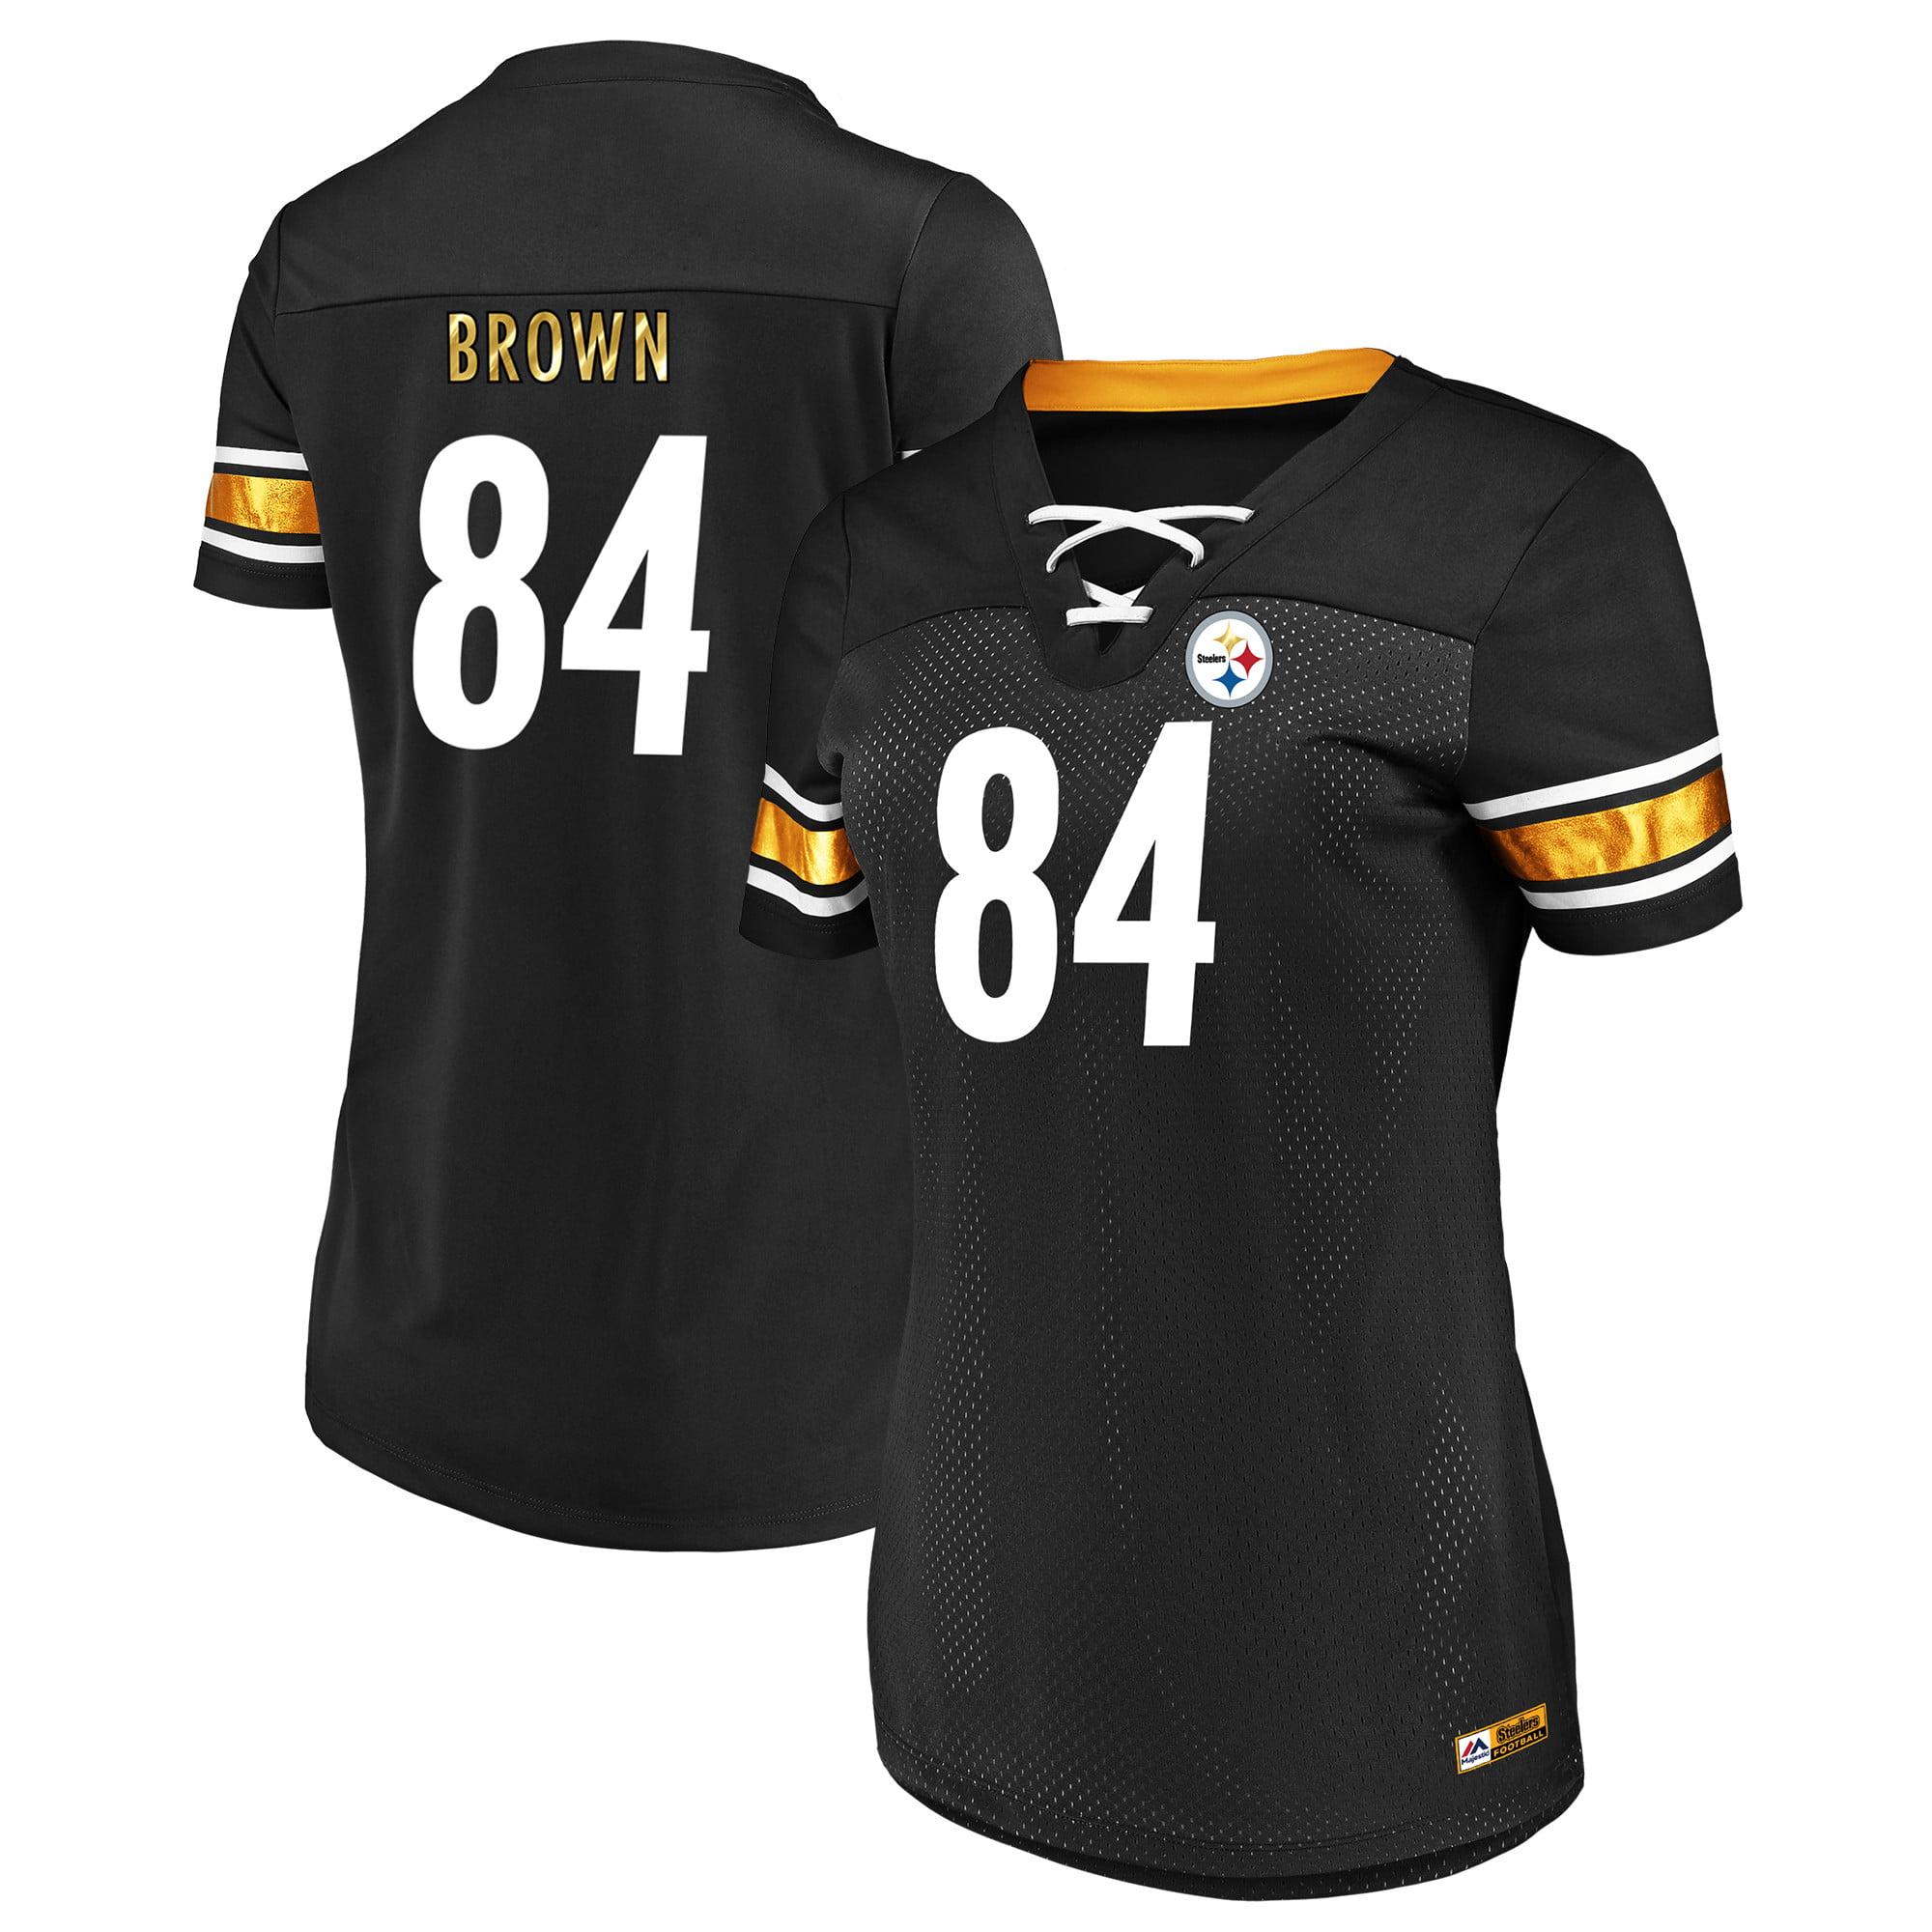 fe2c26f91c5 Antonio Brown Pittsburgh Steelers Majestic Women s Draft Him Fashion Name    Number T-Shirt - Black - Walmart.com